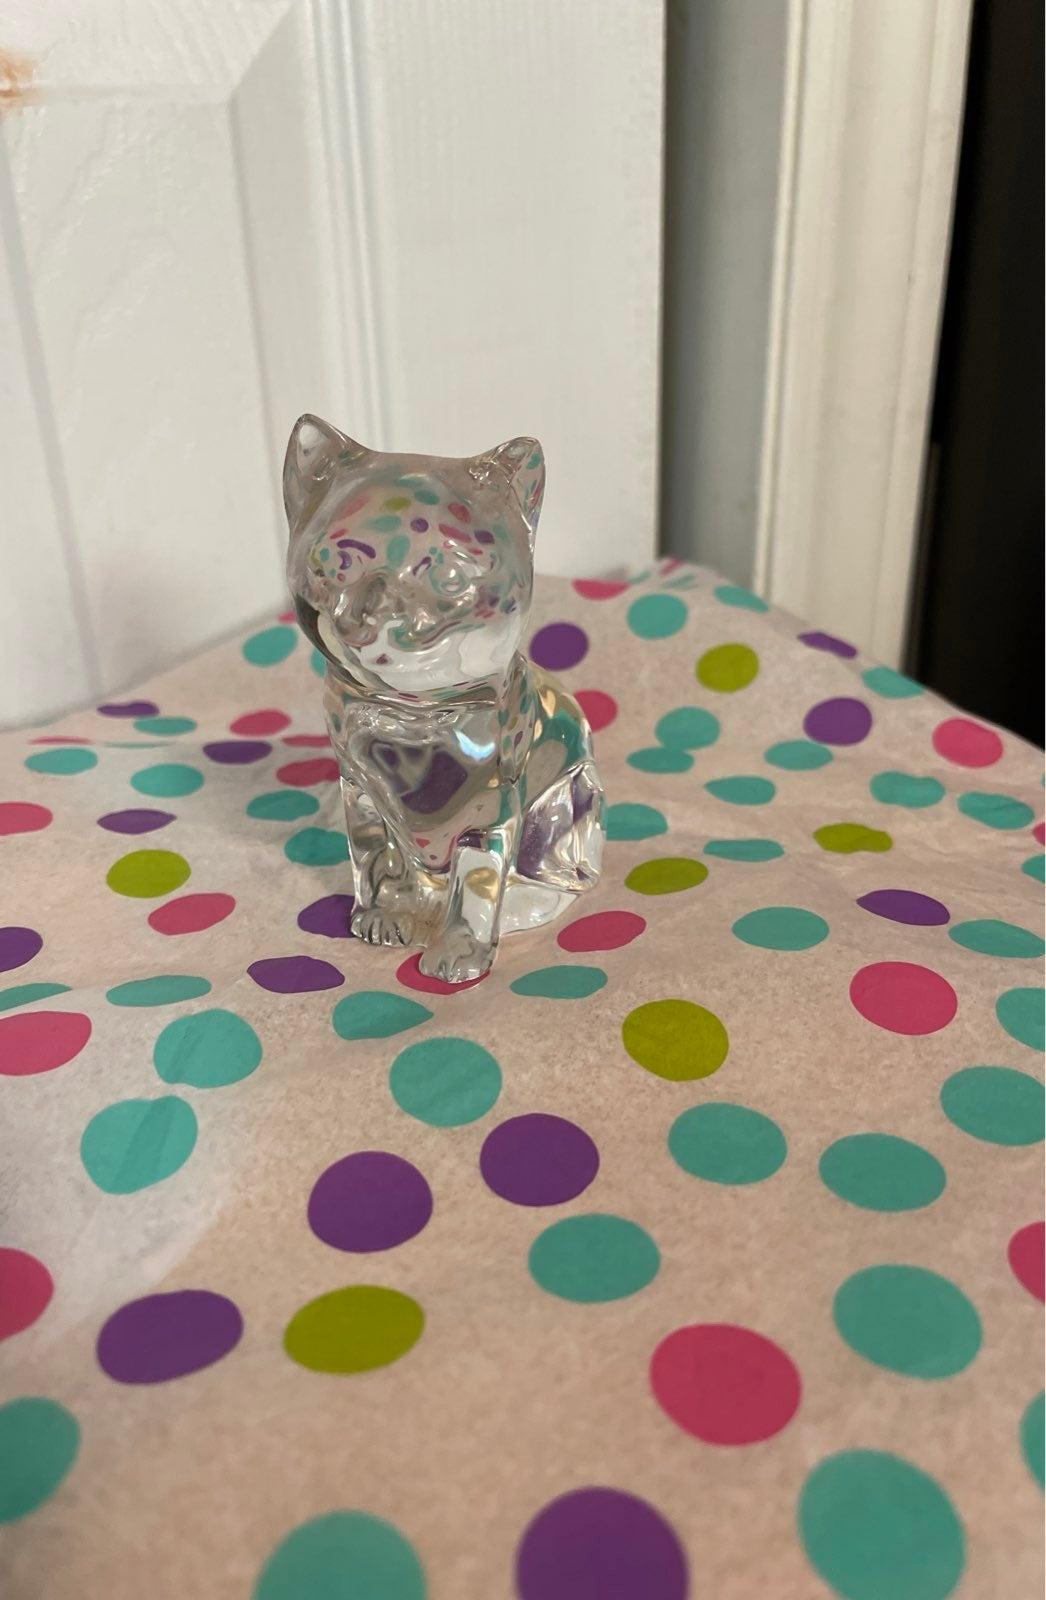 Crystal princess house cat